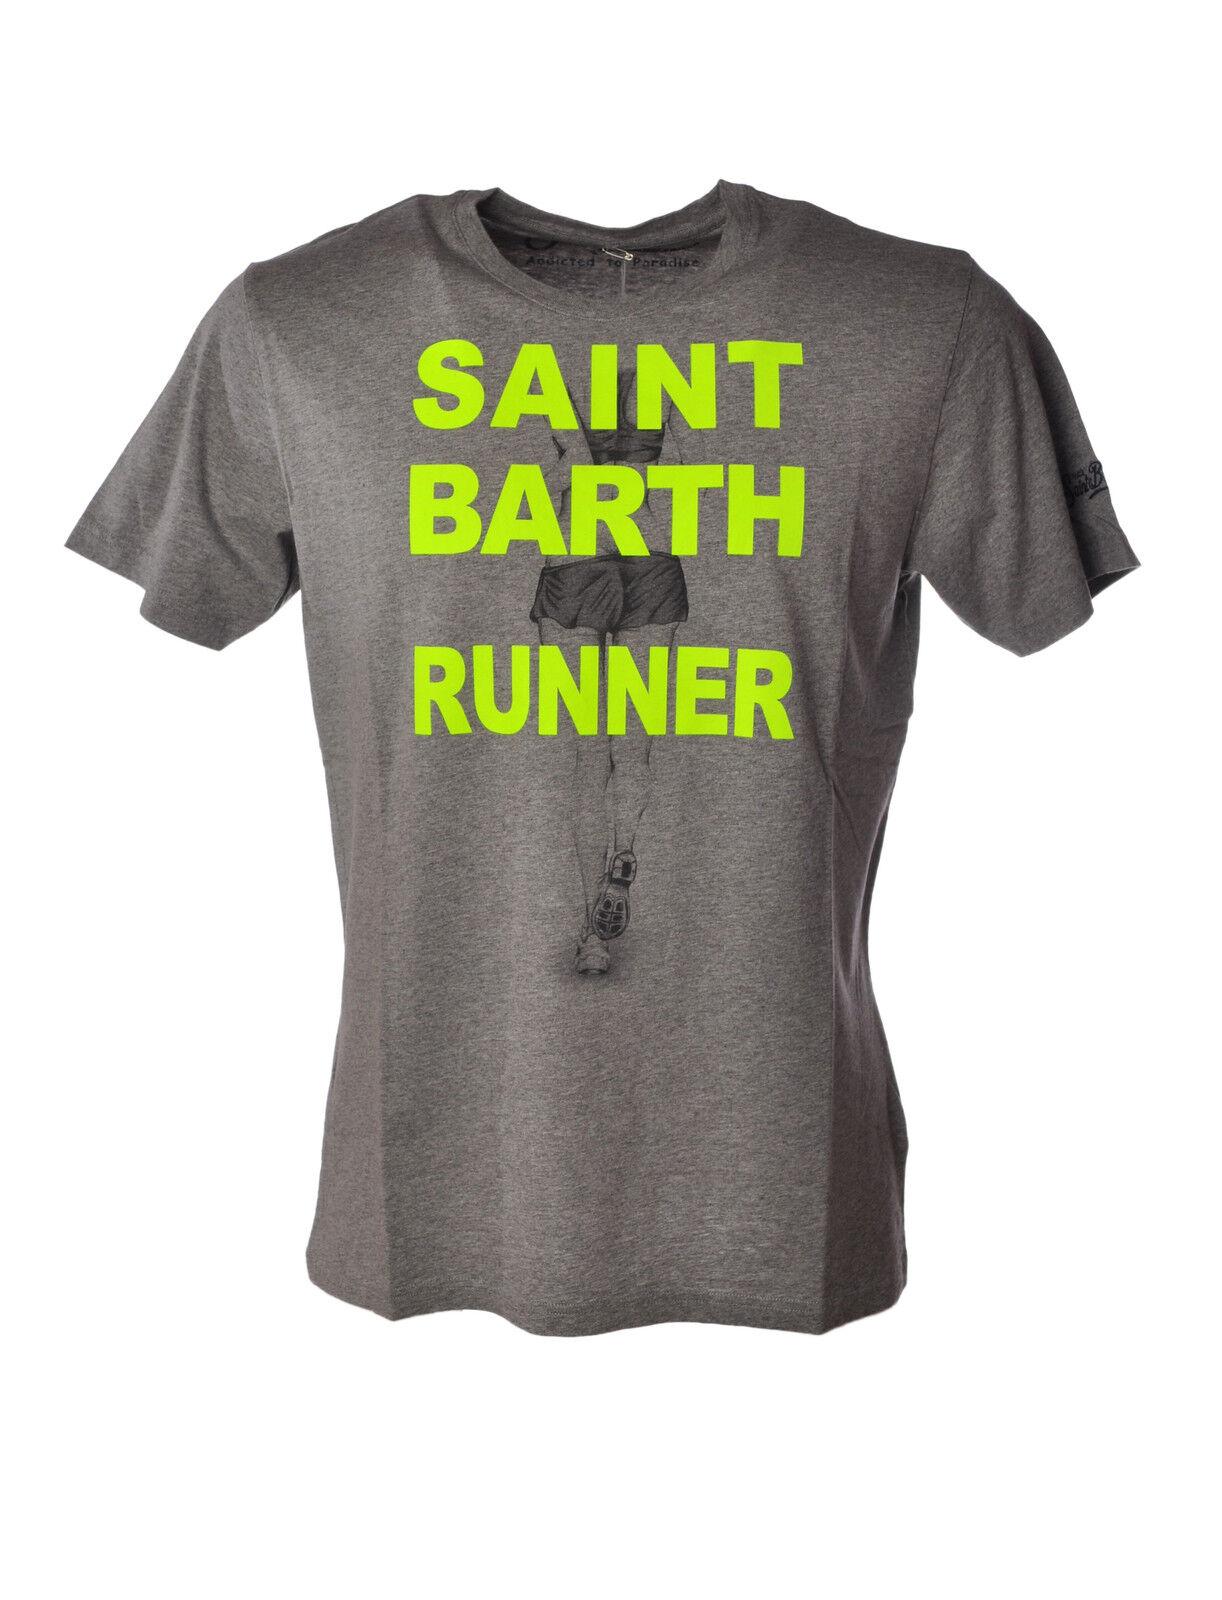 Saint Barth - Topwear-T-shirts - Man - Grau - 3497810C184212